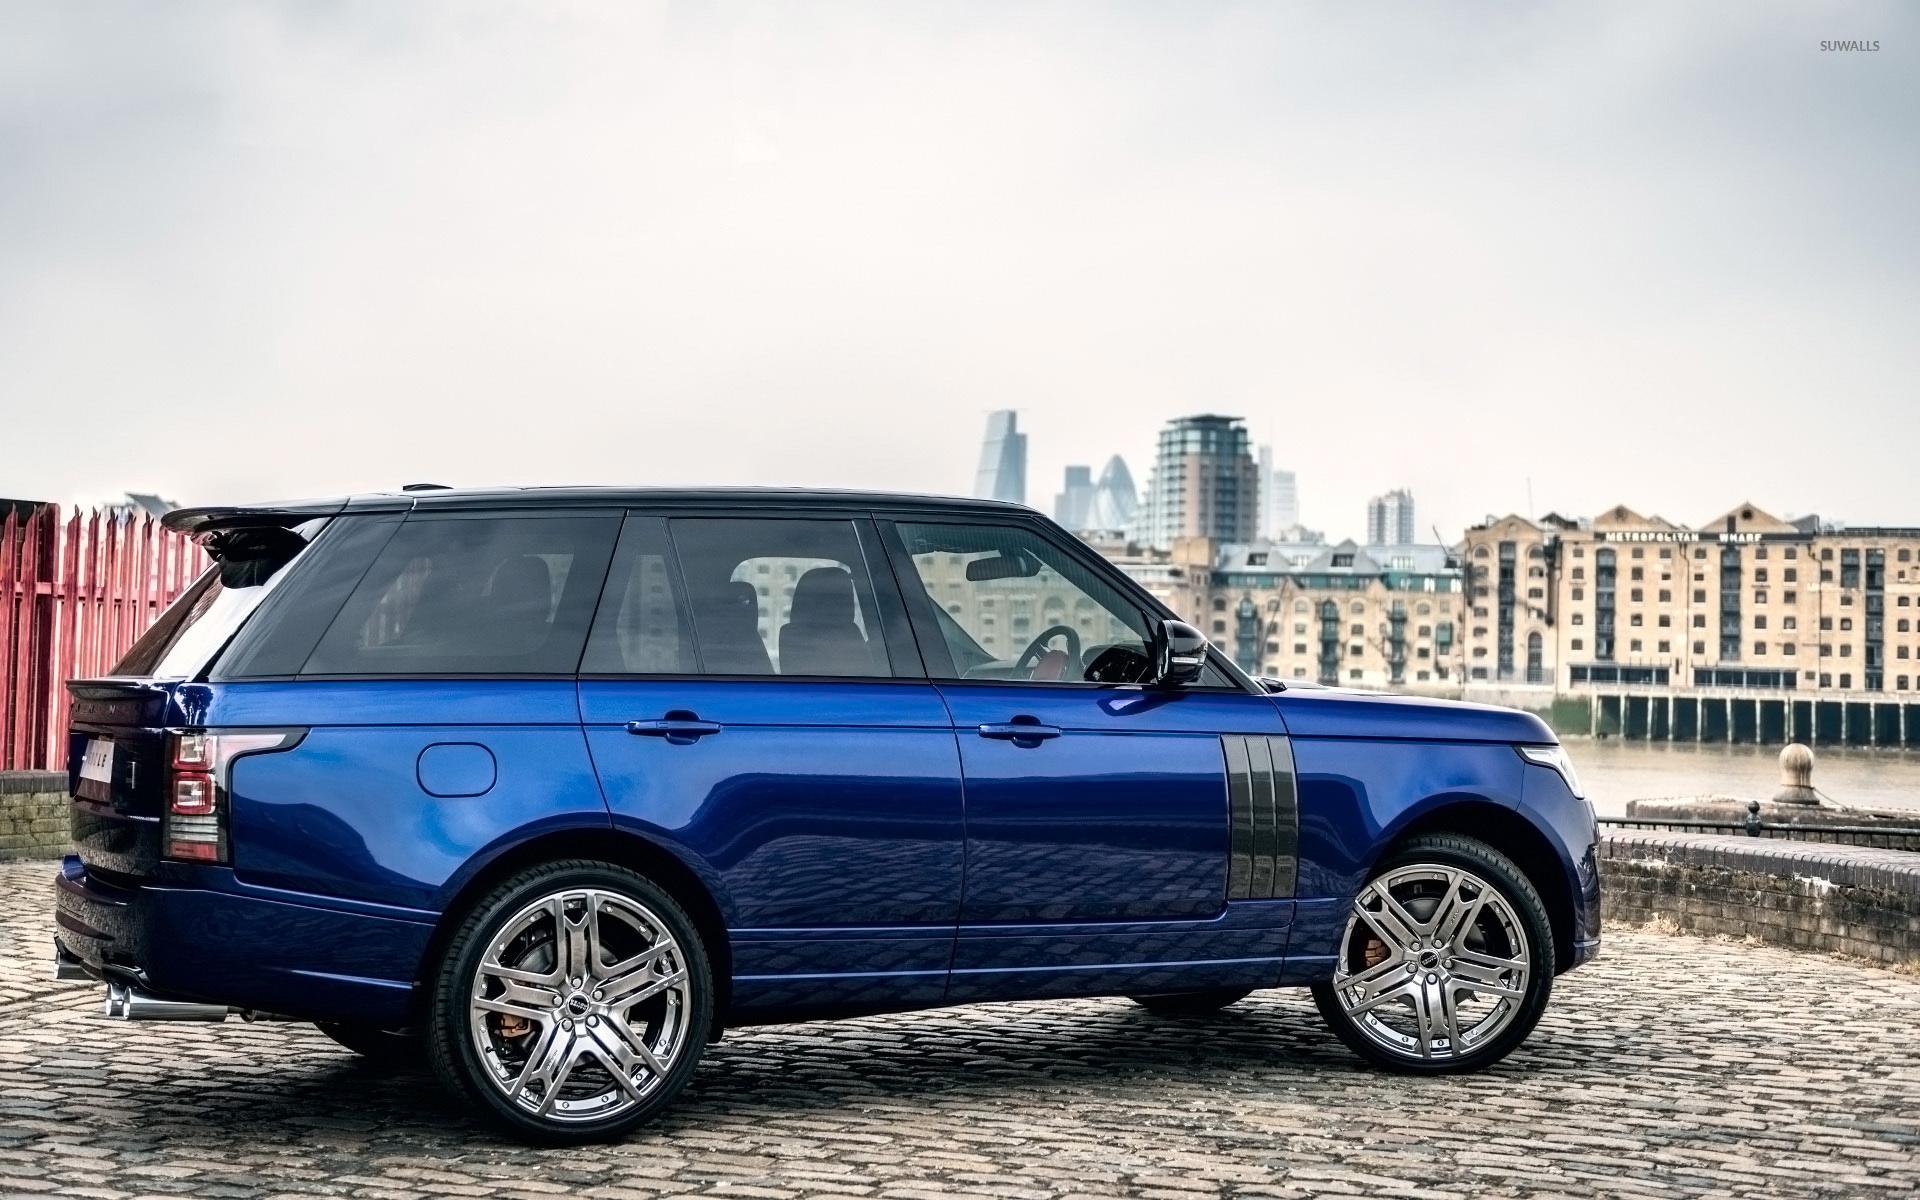 2013 land rover defender by kahn design youtube - Blue 2013 A Kahn Design Land Rover Range Rover 600le Wallpaper